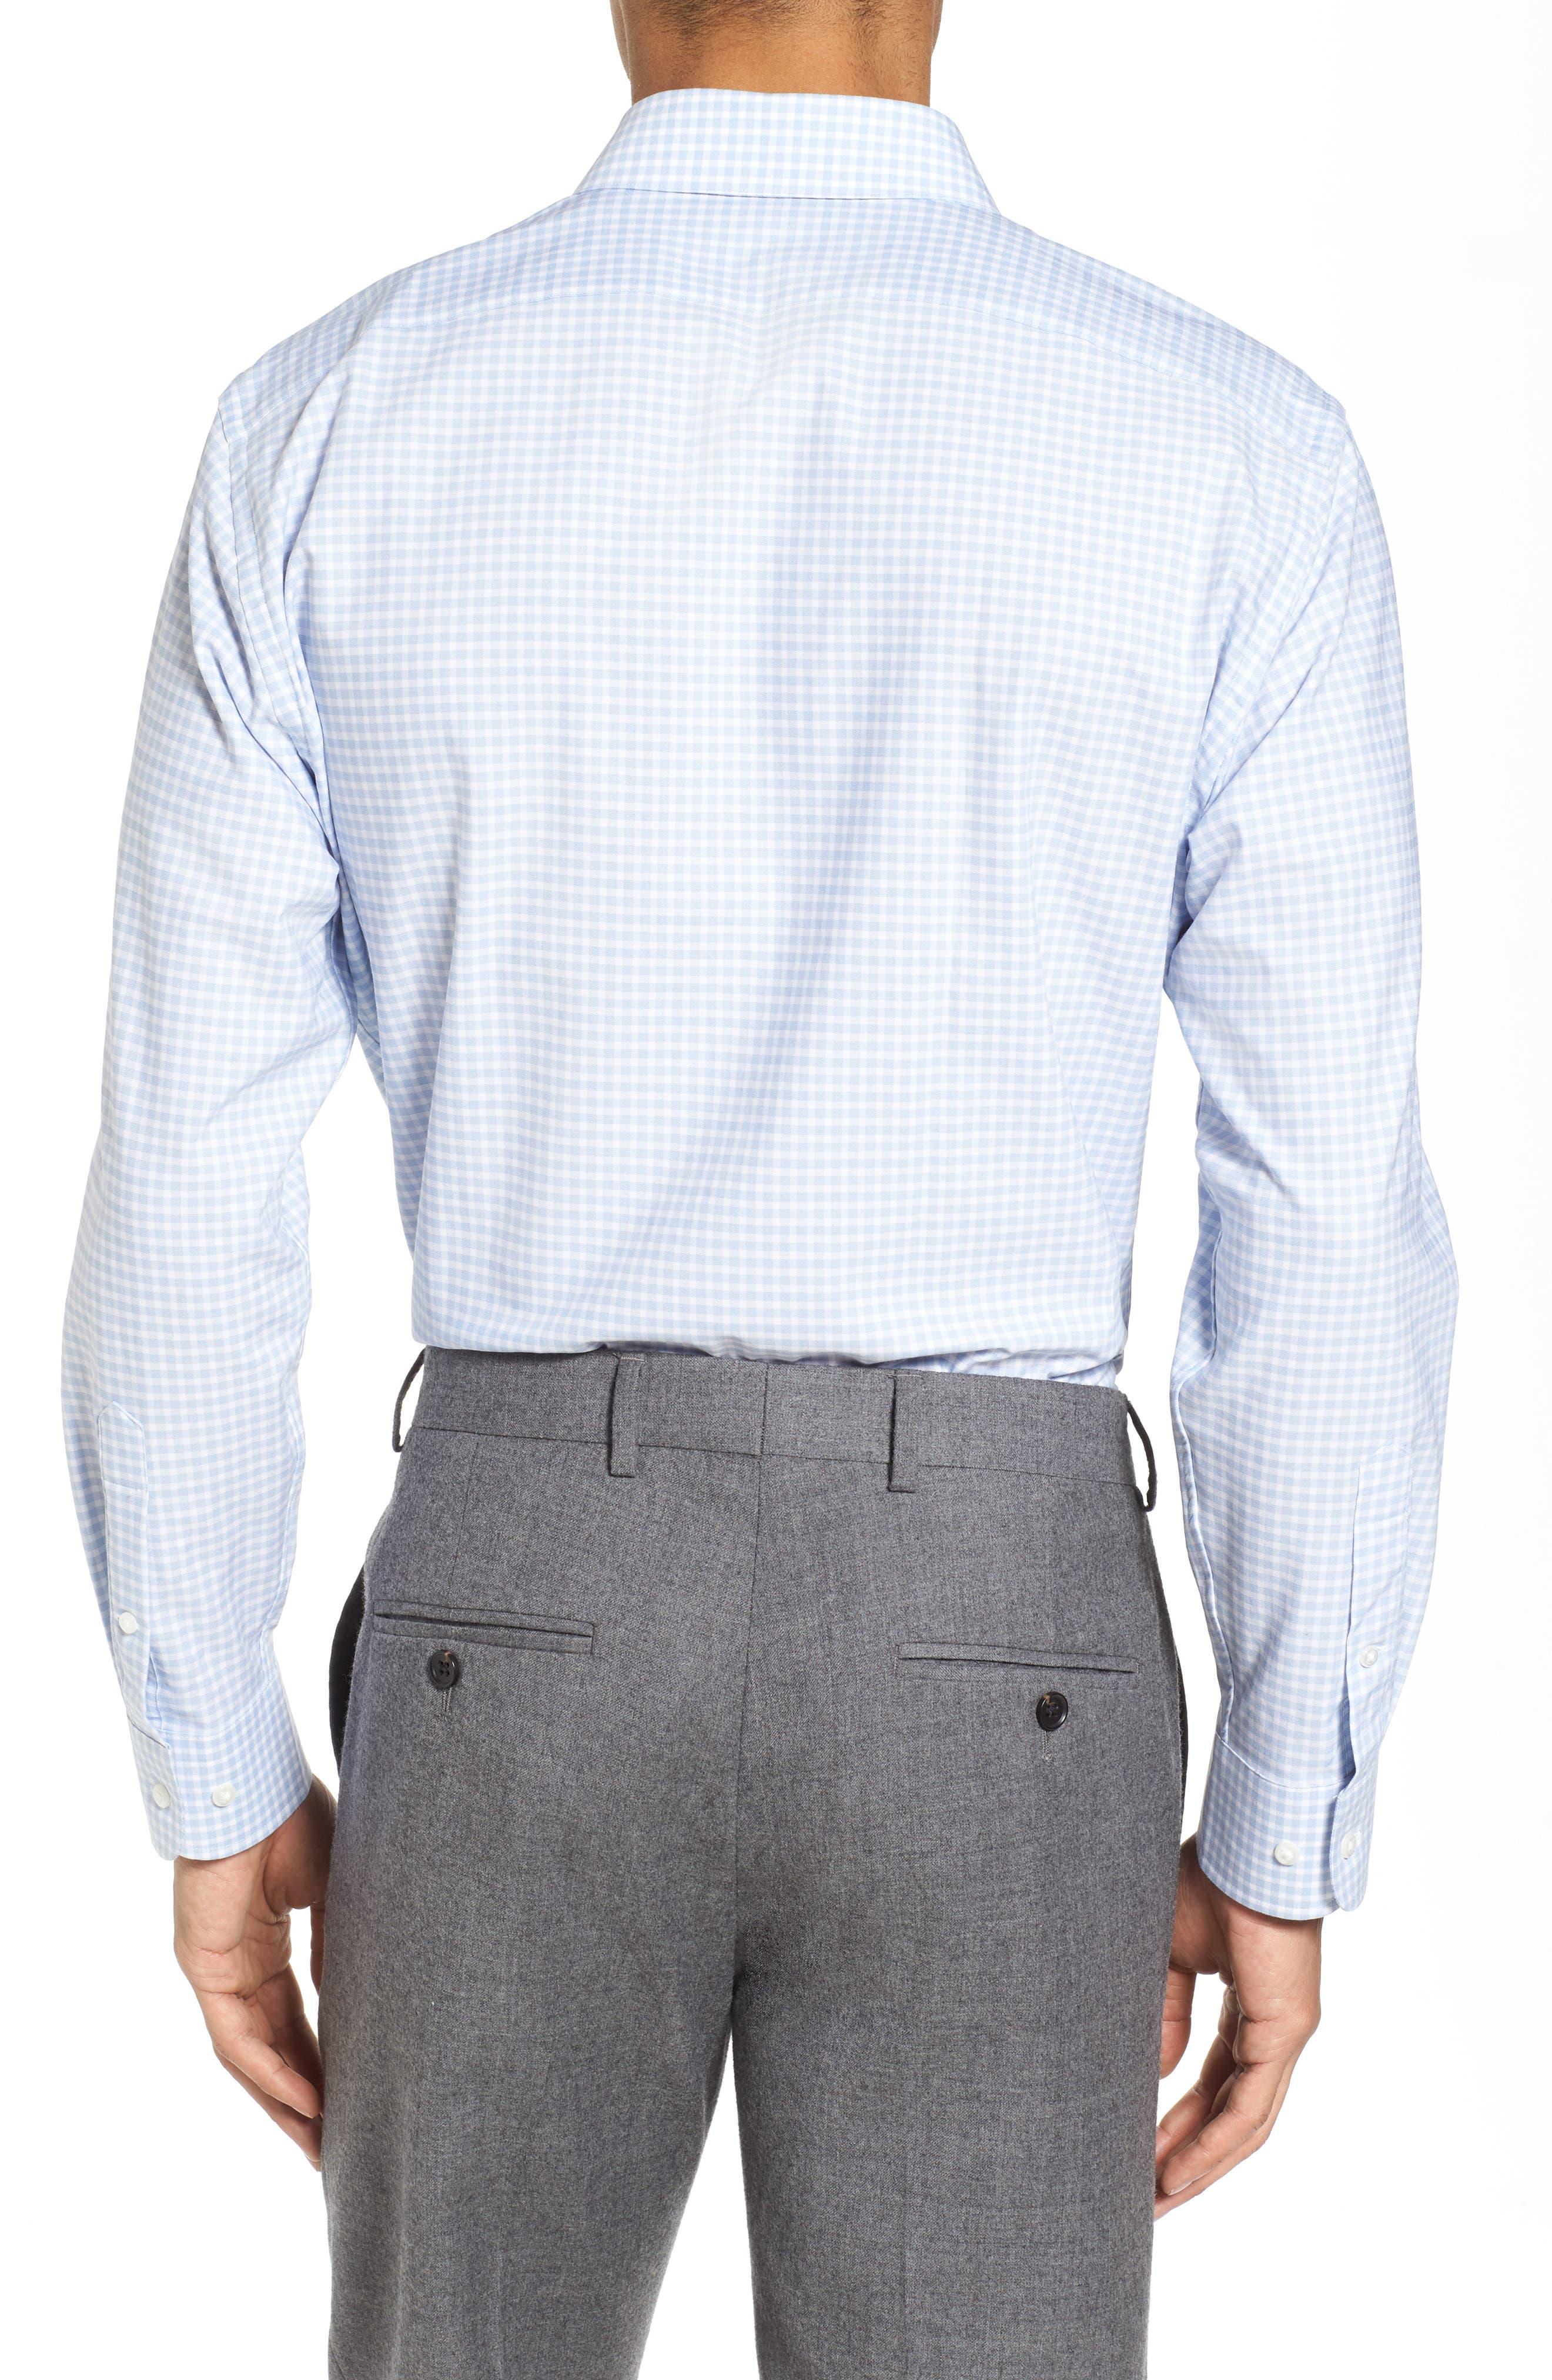 Tech-Smart Trim Fit Stretch Check Dress Shirt,                             Alternate thumbnail 3, color,                             Blue Brunerra